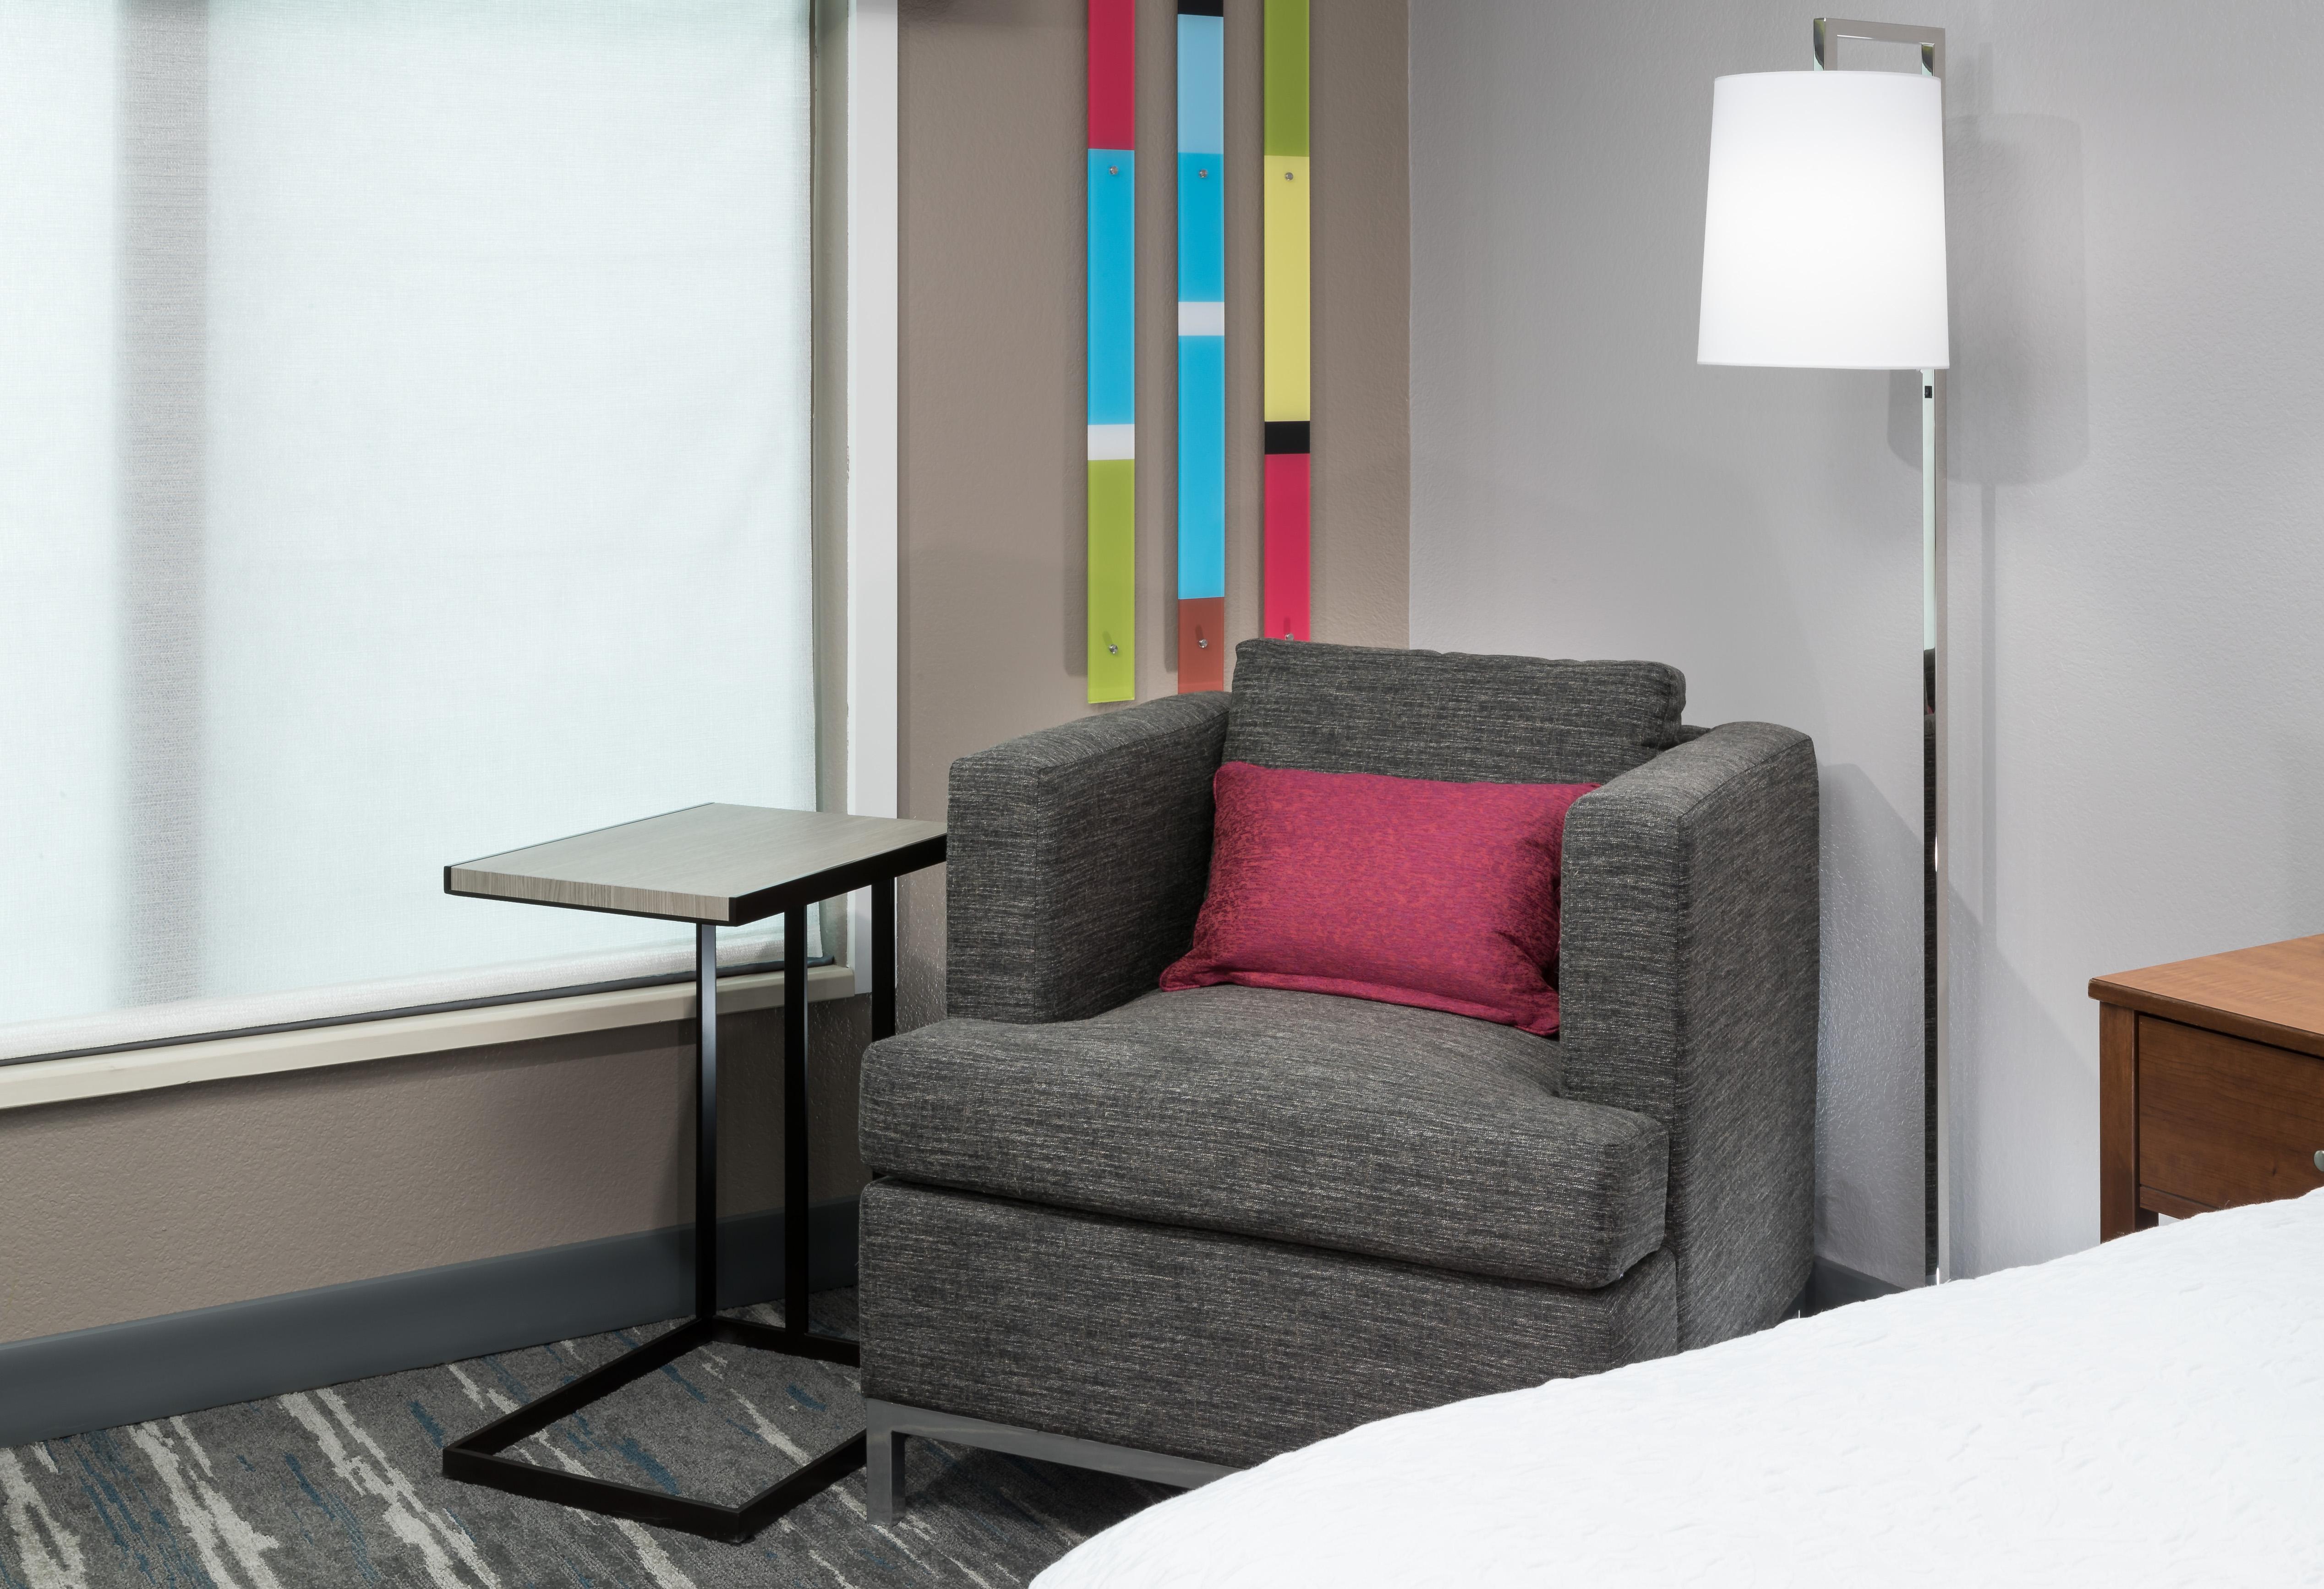 https://www.hotelsbyday.com/_data/default-hotel_image/4/23597/ahr-4274-chiskhx-417-kxtd.jpg